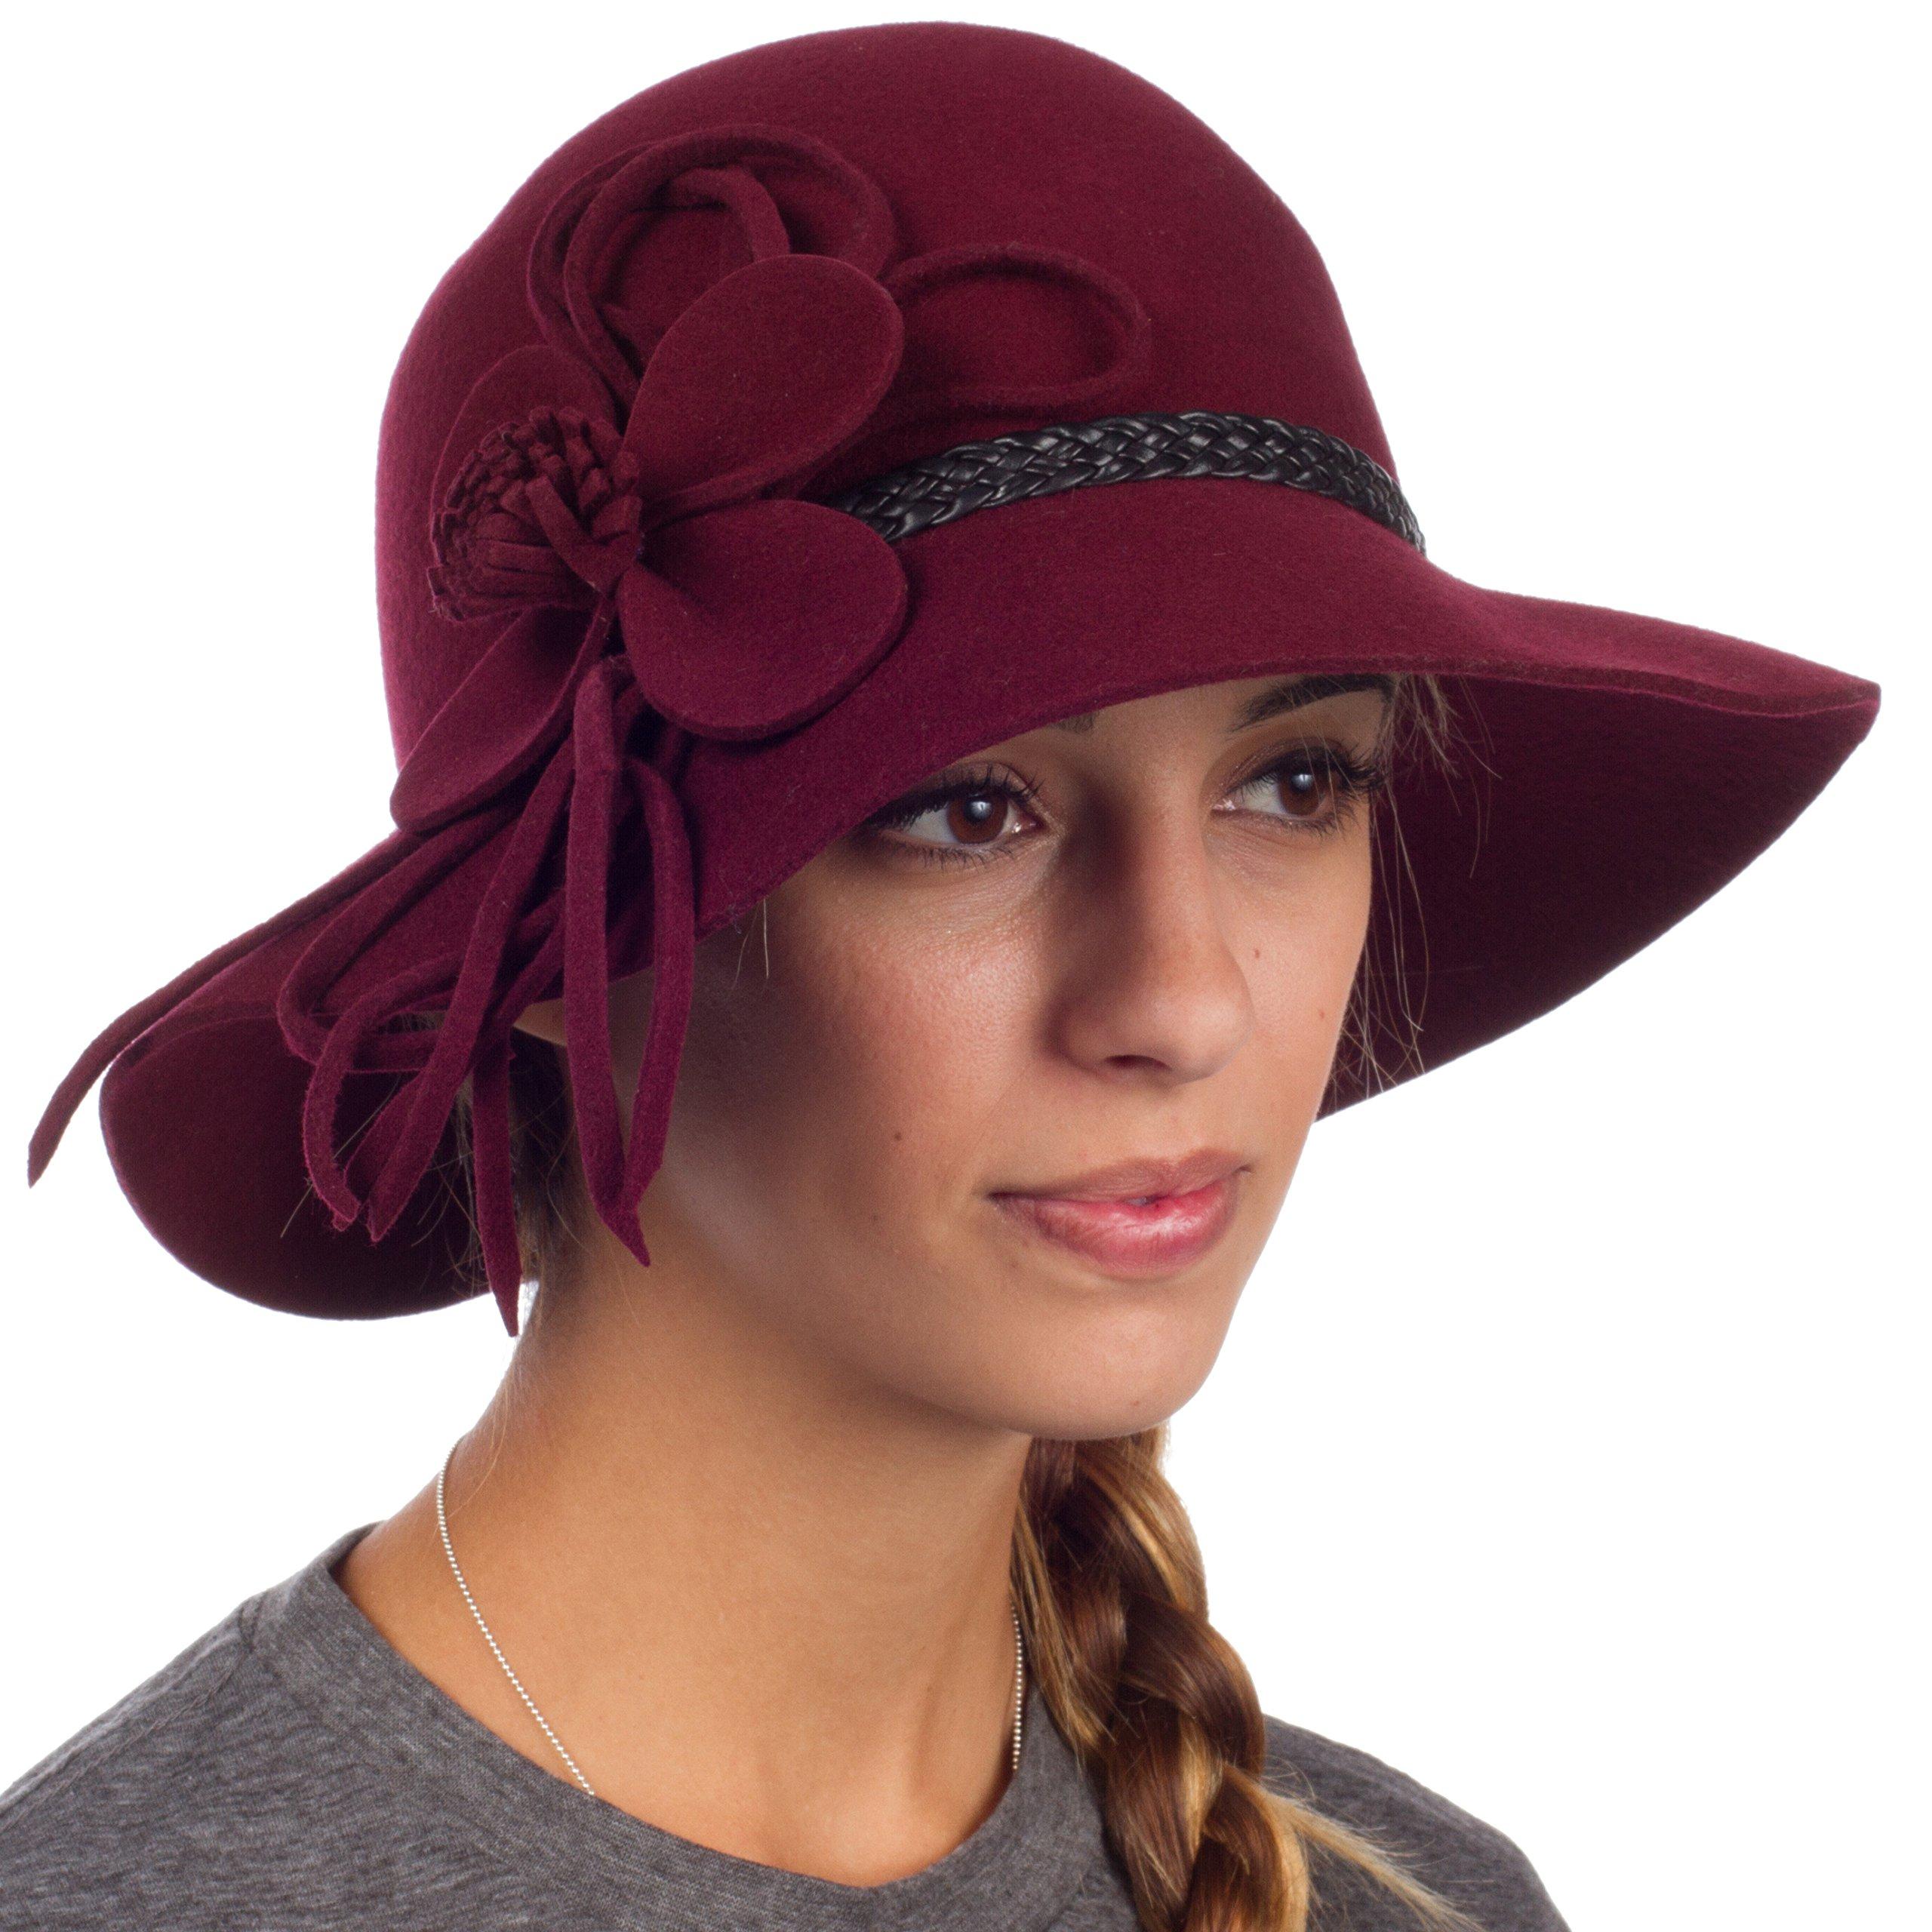 Sakkas 30M Gloria Vintage Style Wool Cloche Hat - Burgundy - One Size by Sakkas